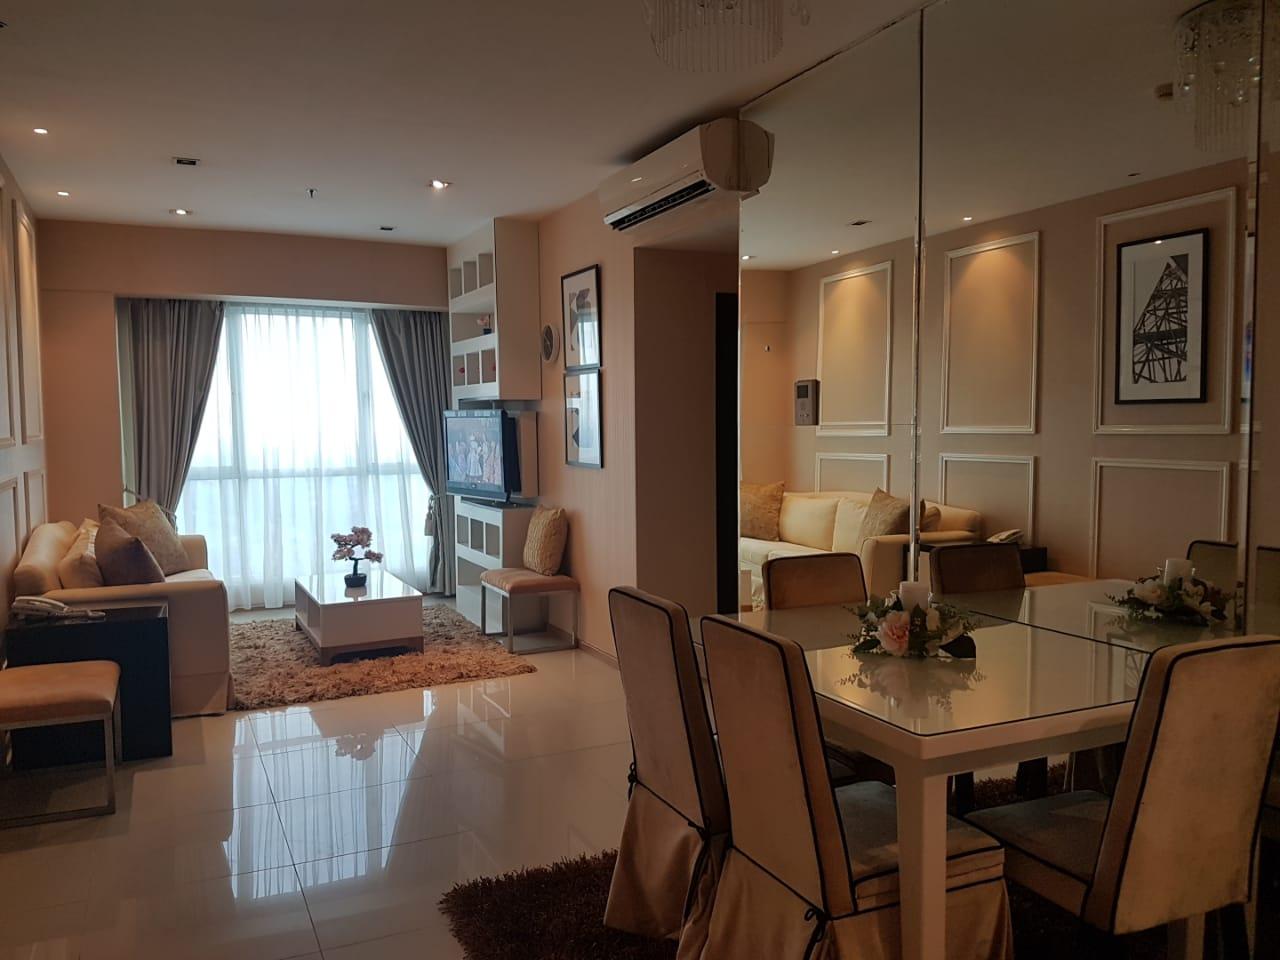 Dijual apartment Gandaria Heights @gandaria city Mall jakarta selatan